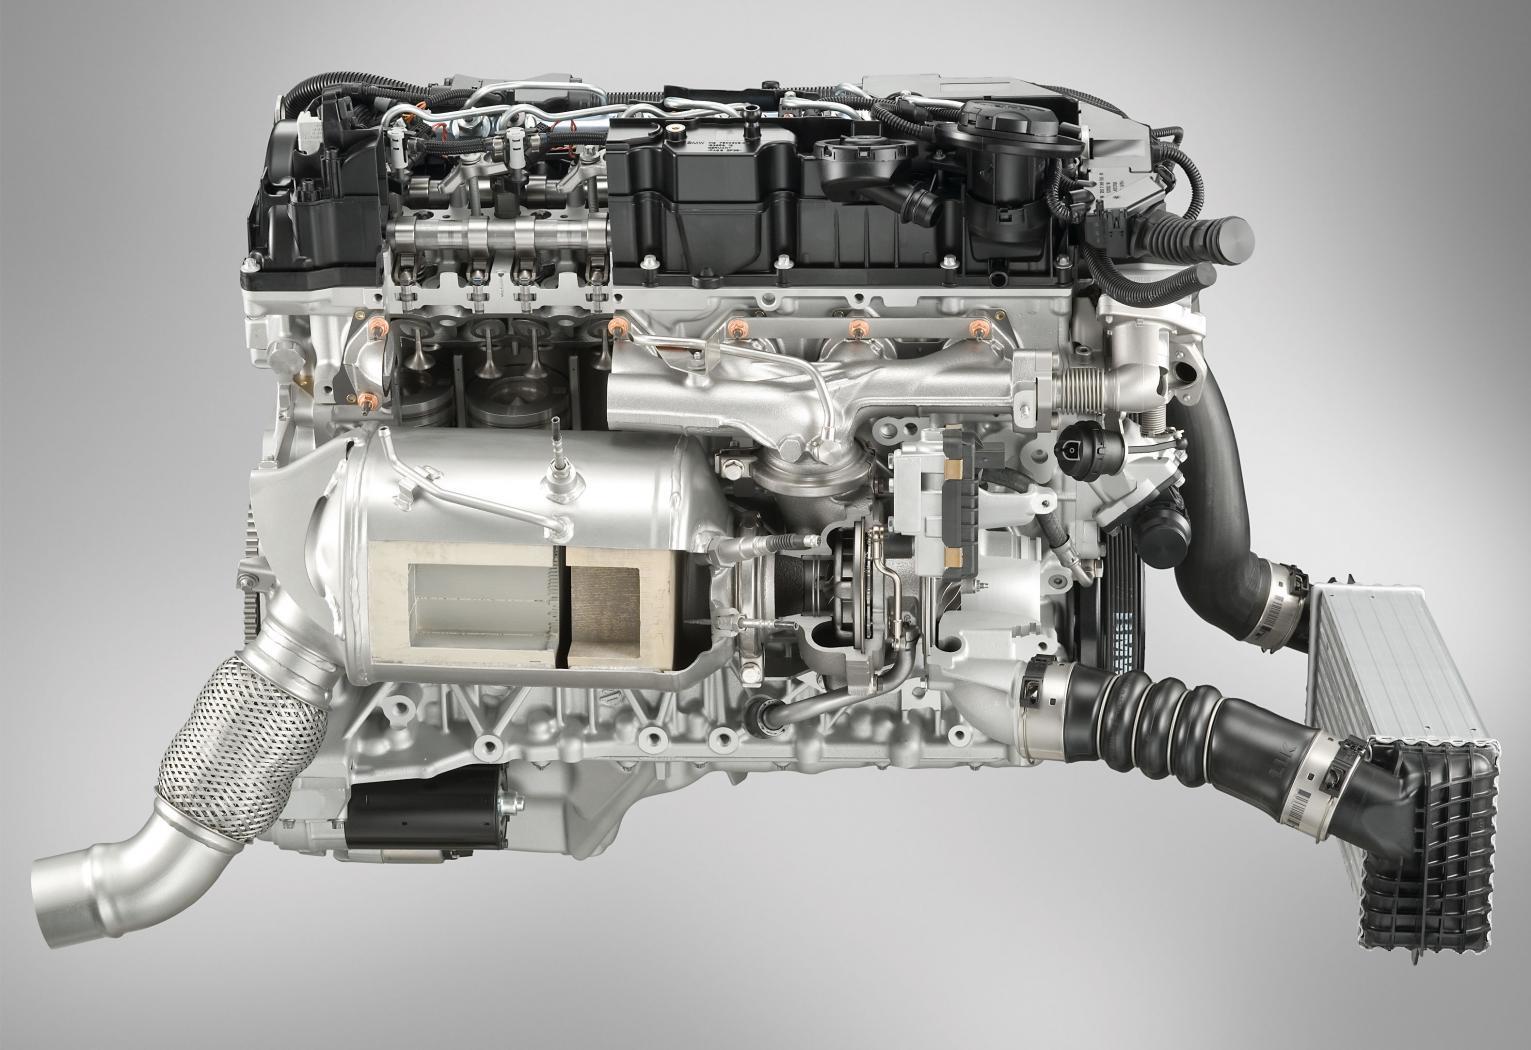 Moteurs-BMW-six-cylindres-en-ligne-11.jpeg